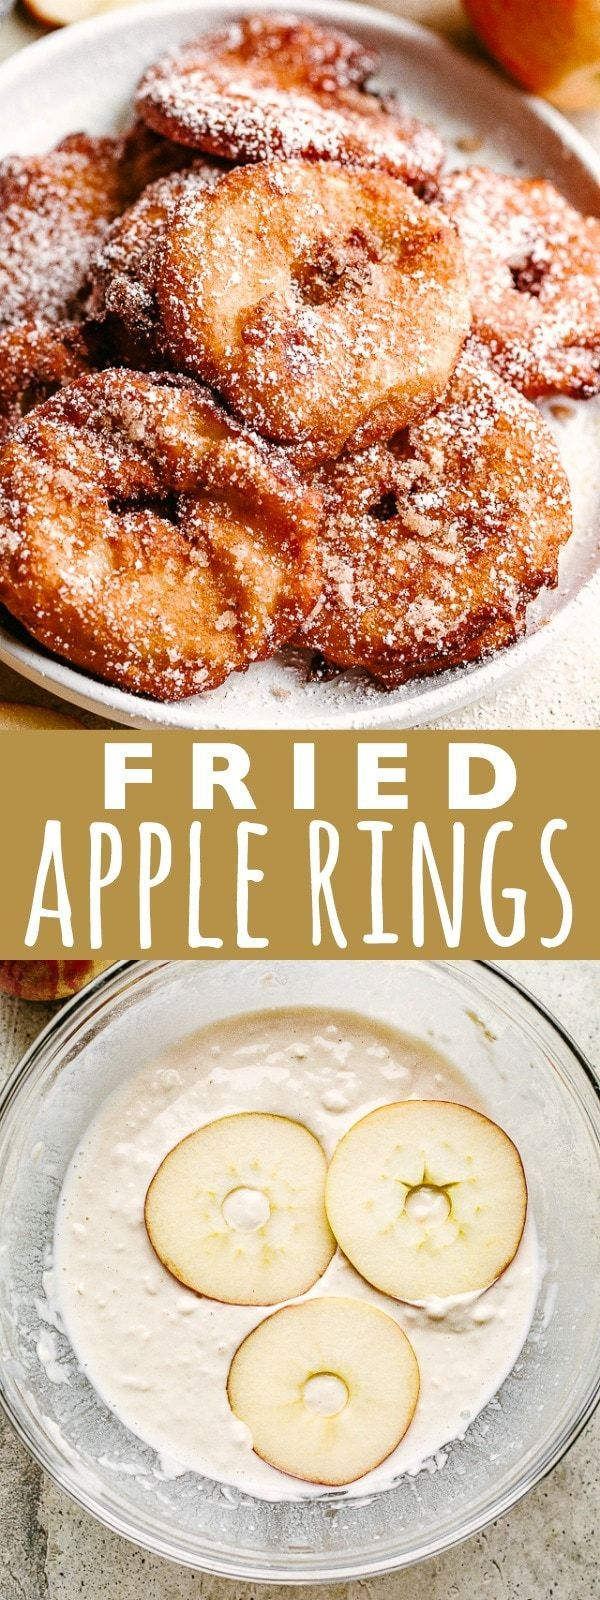 Apple Rings Recipe   Diethood #applerecipes